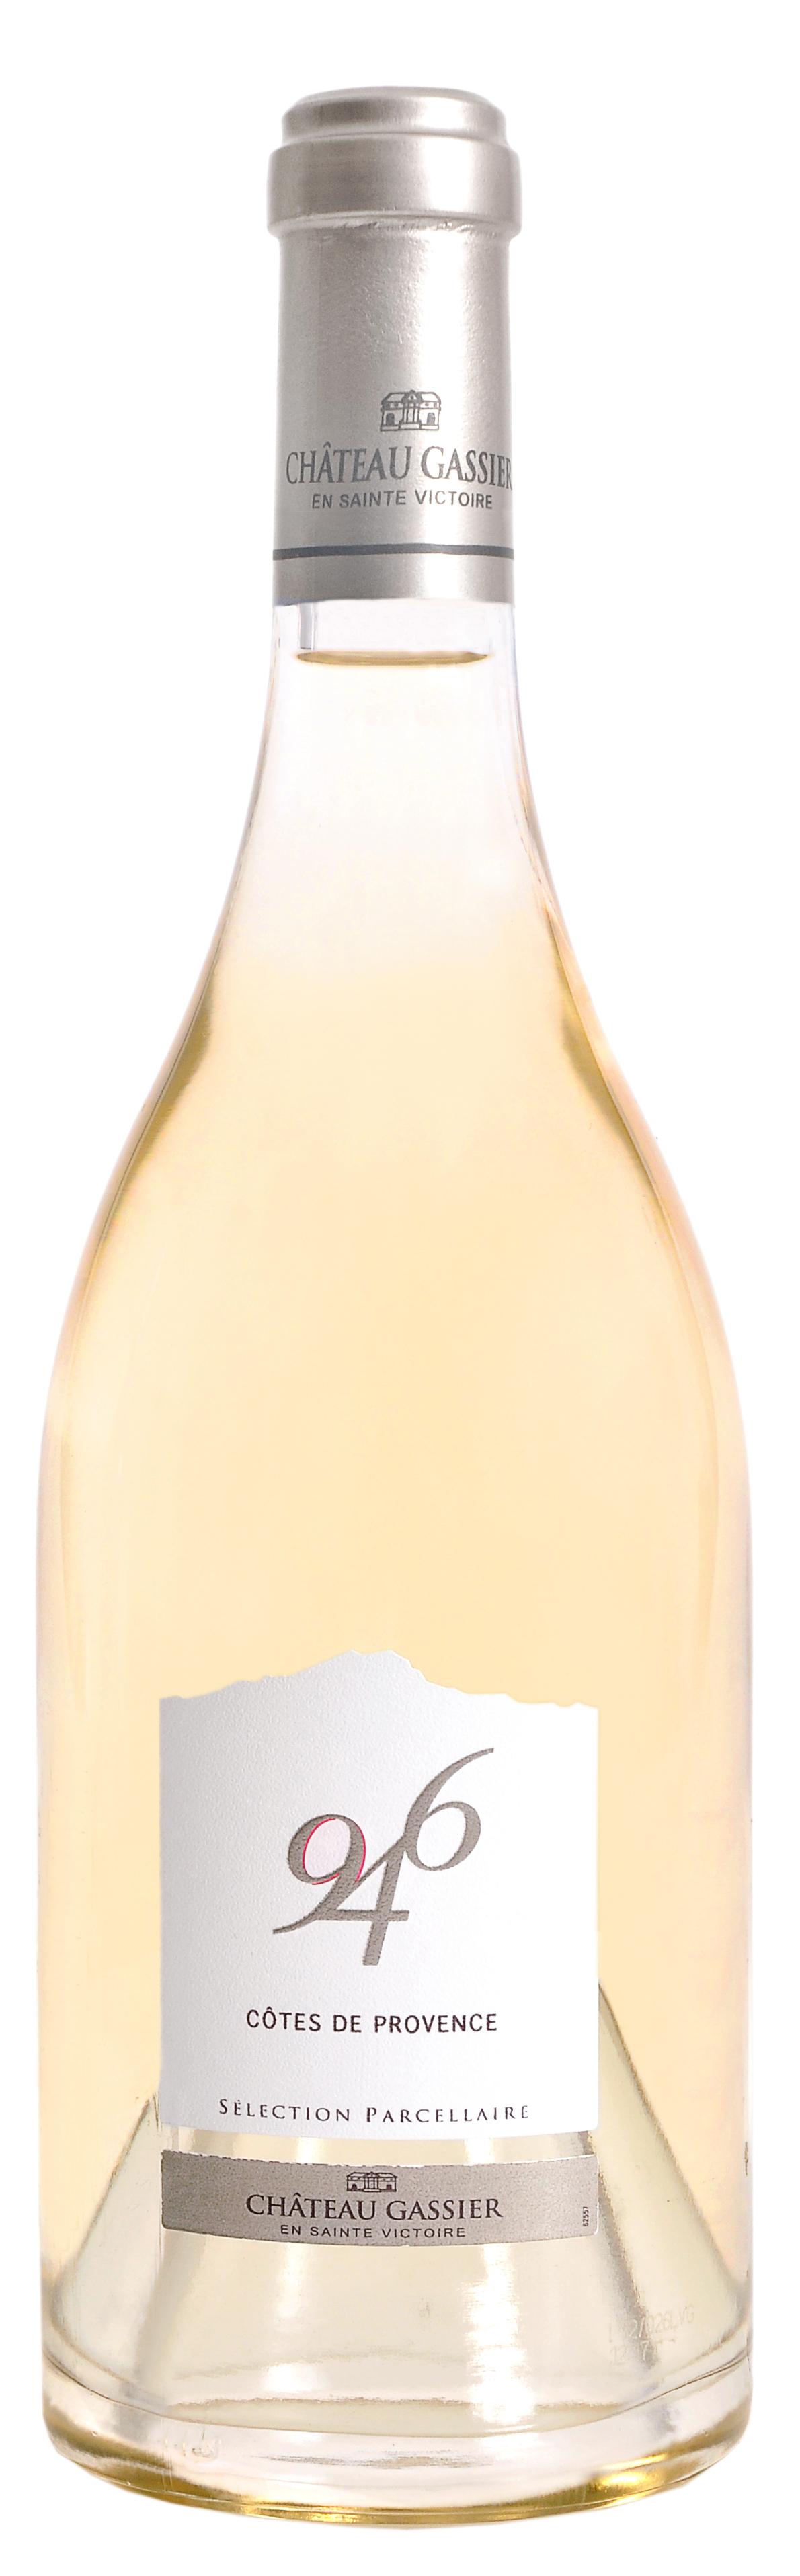 Château Gassier Cuvee 946 Blanc